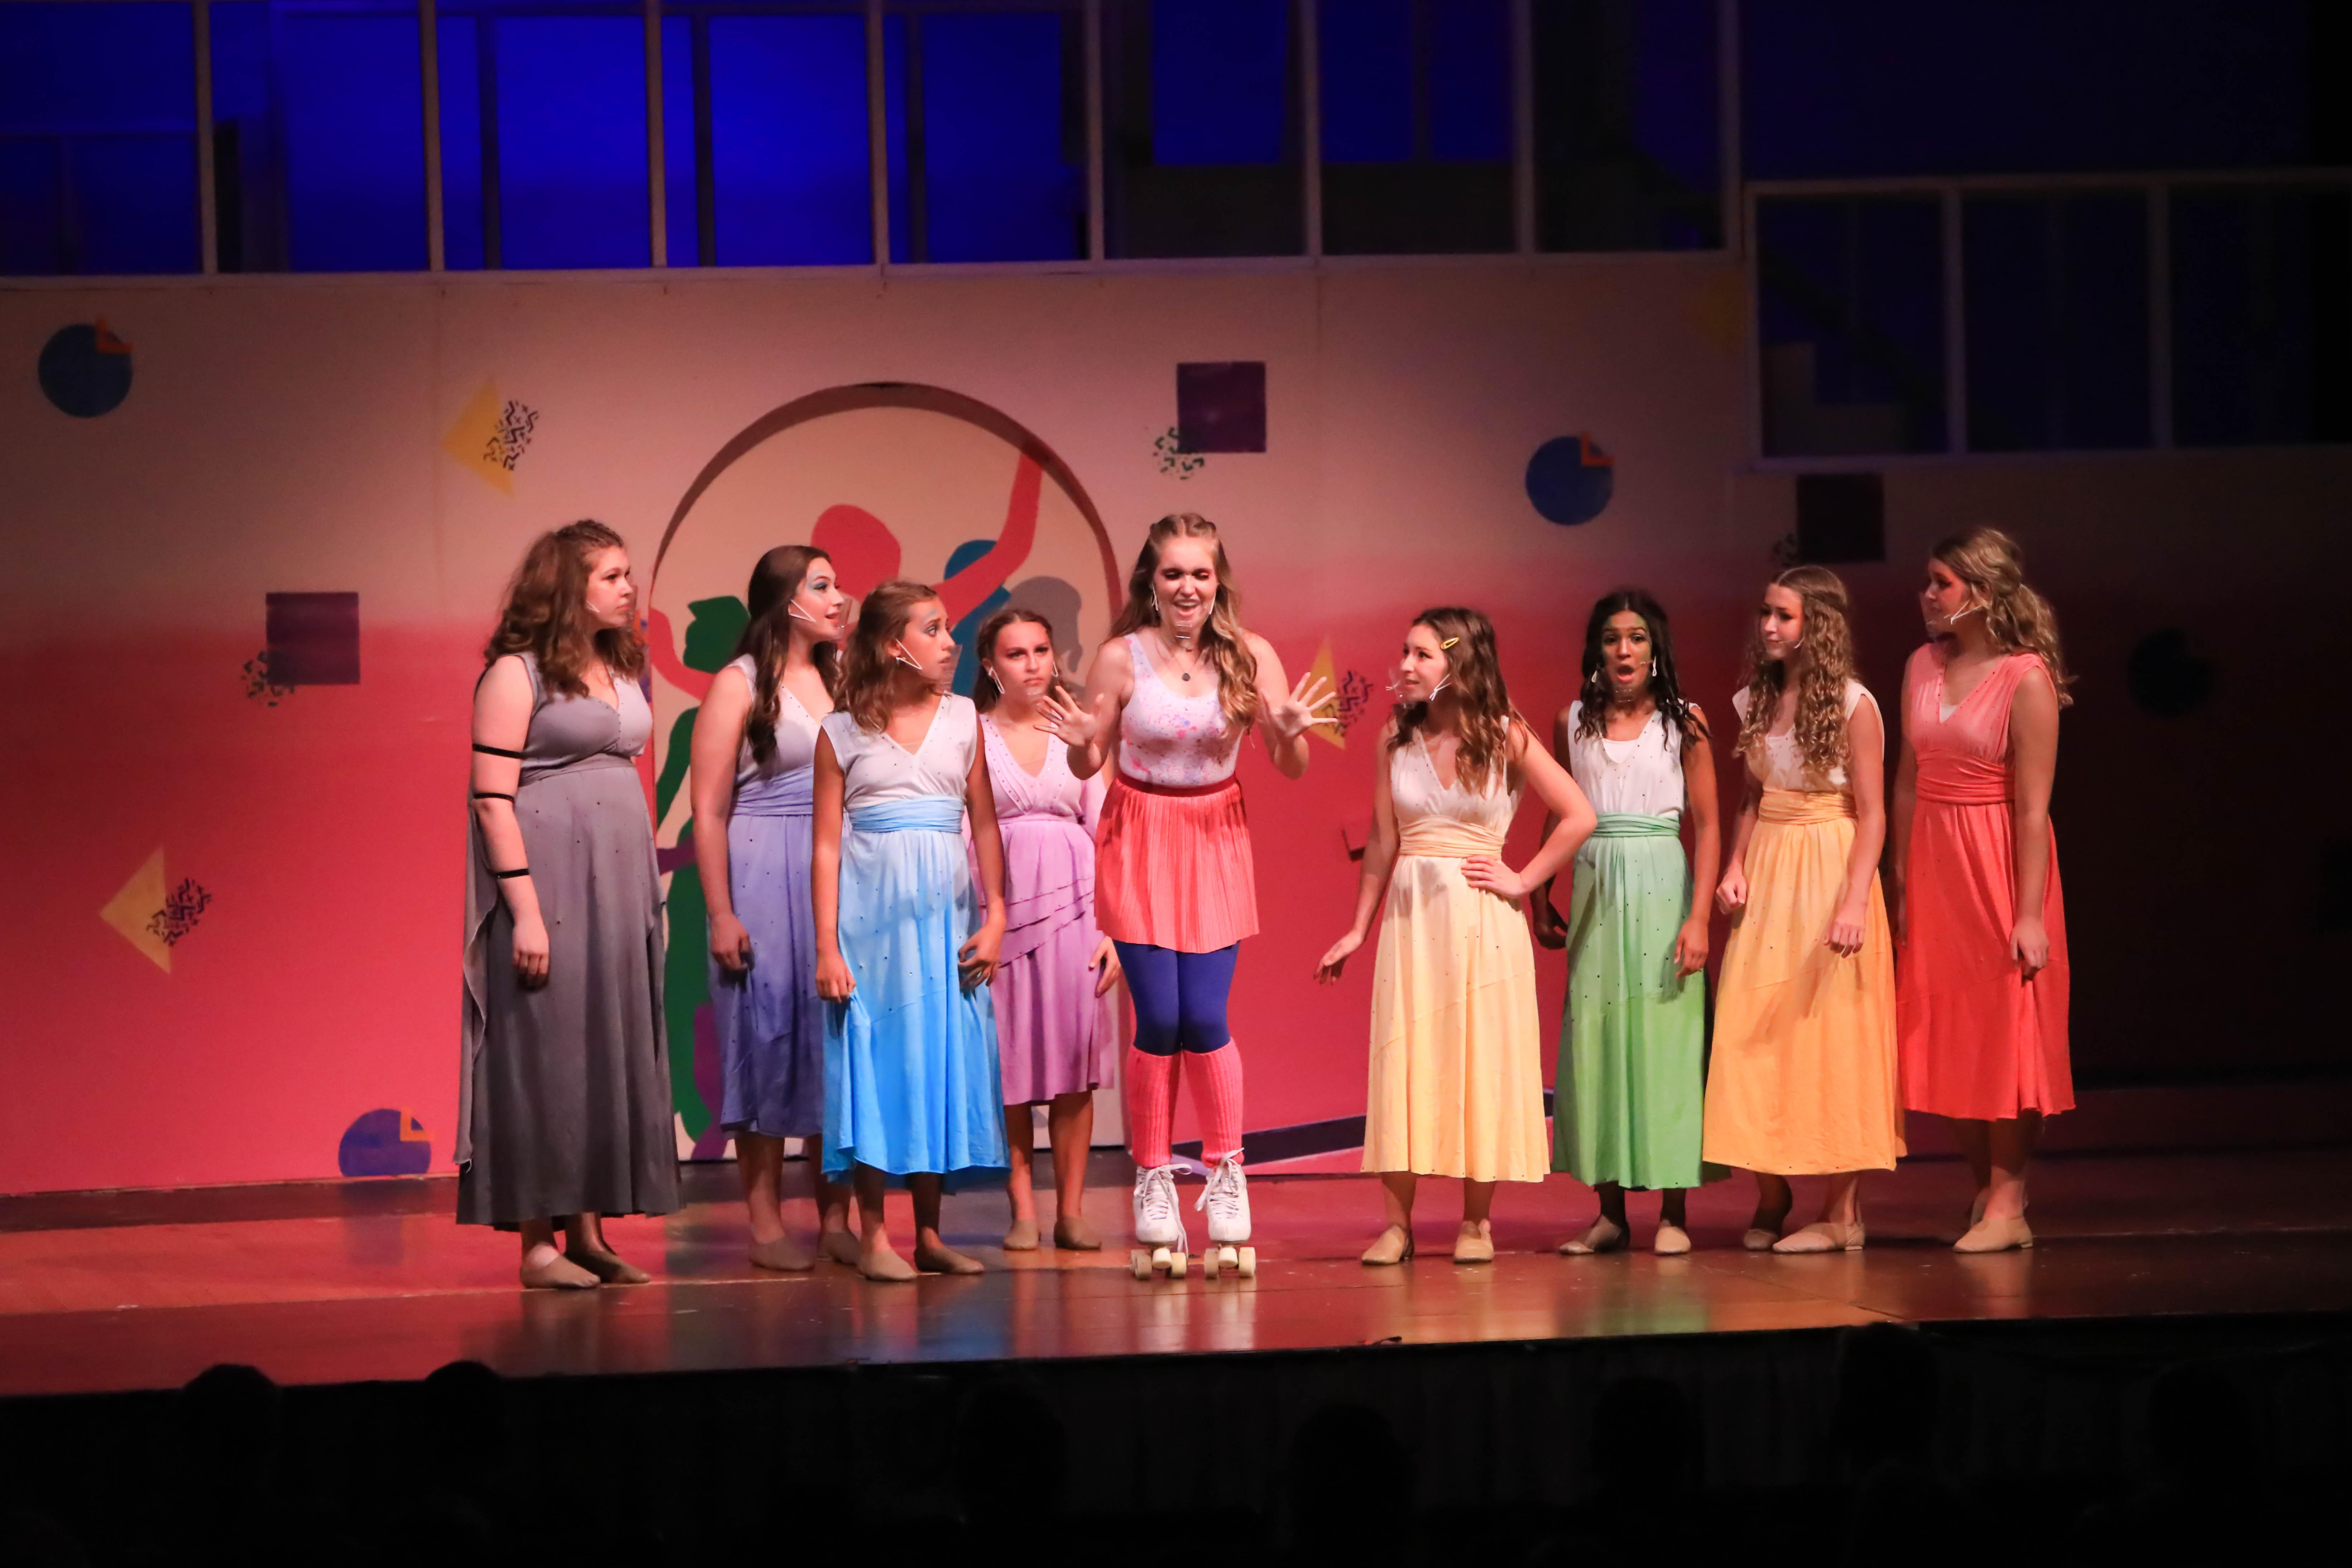 Xanadu musical theatre kansas city performing arts acting